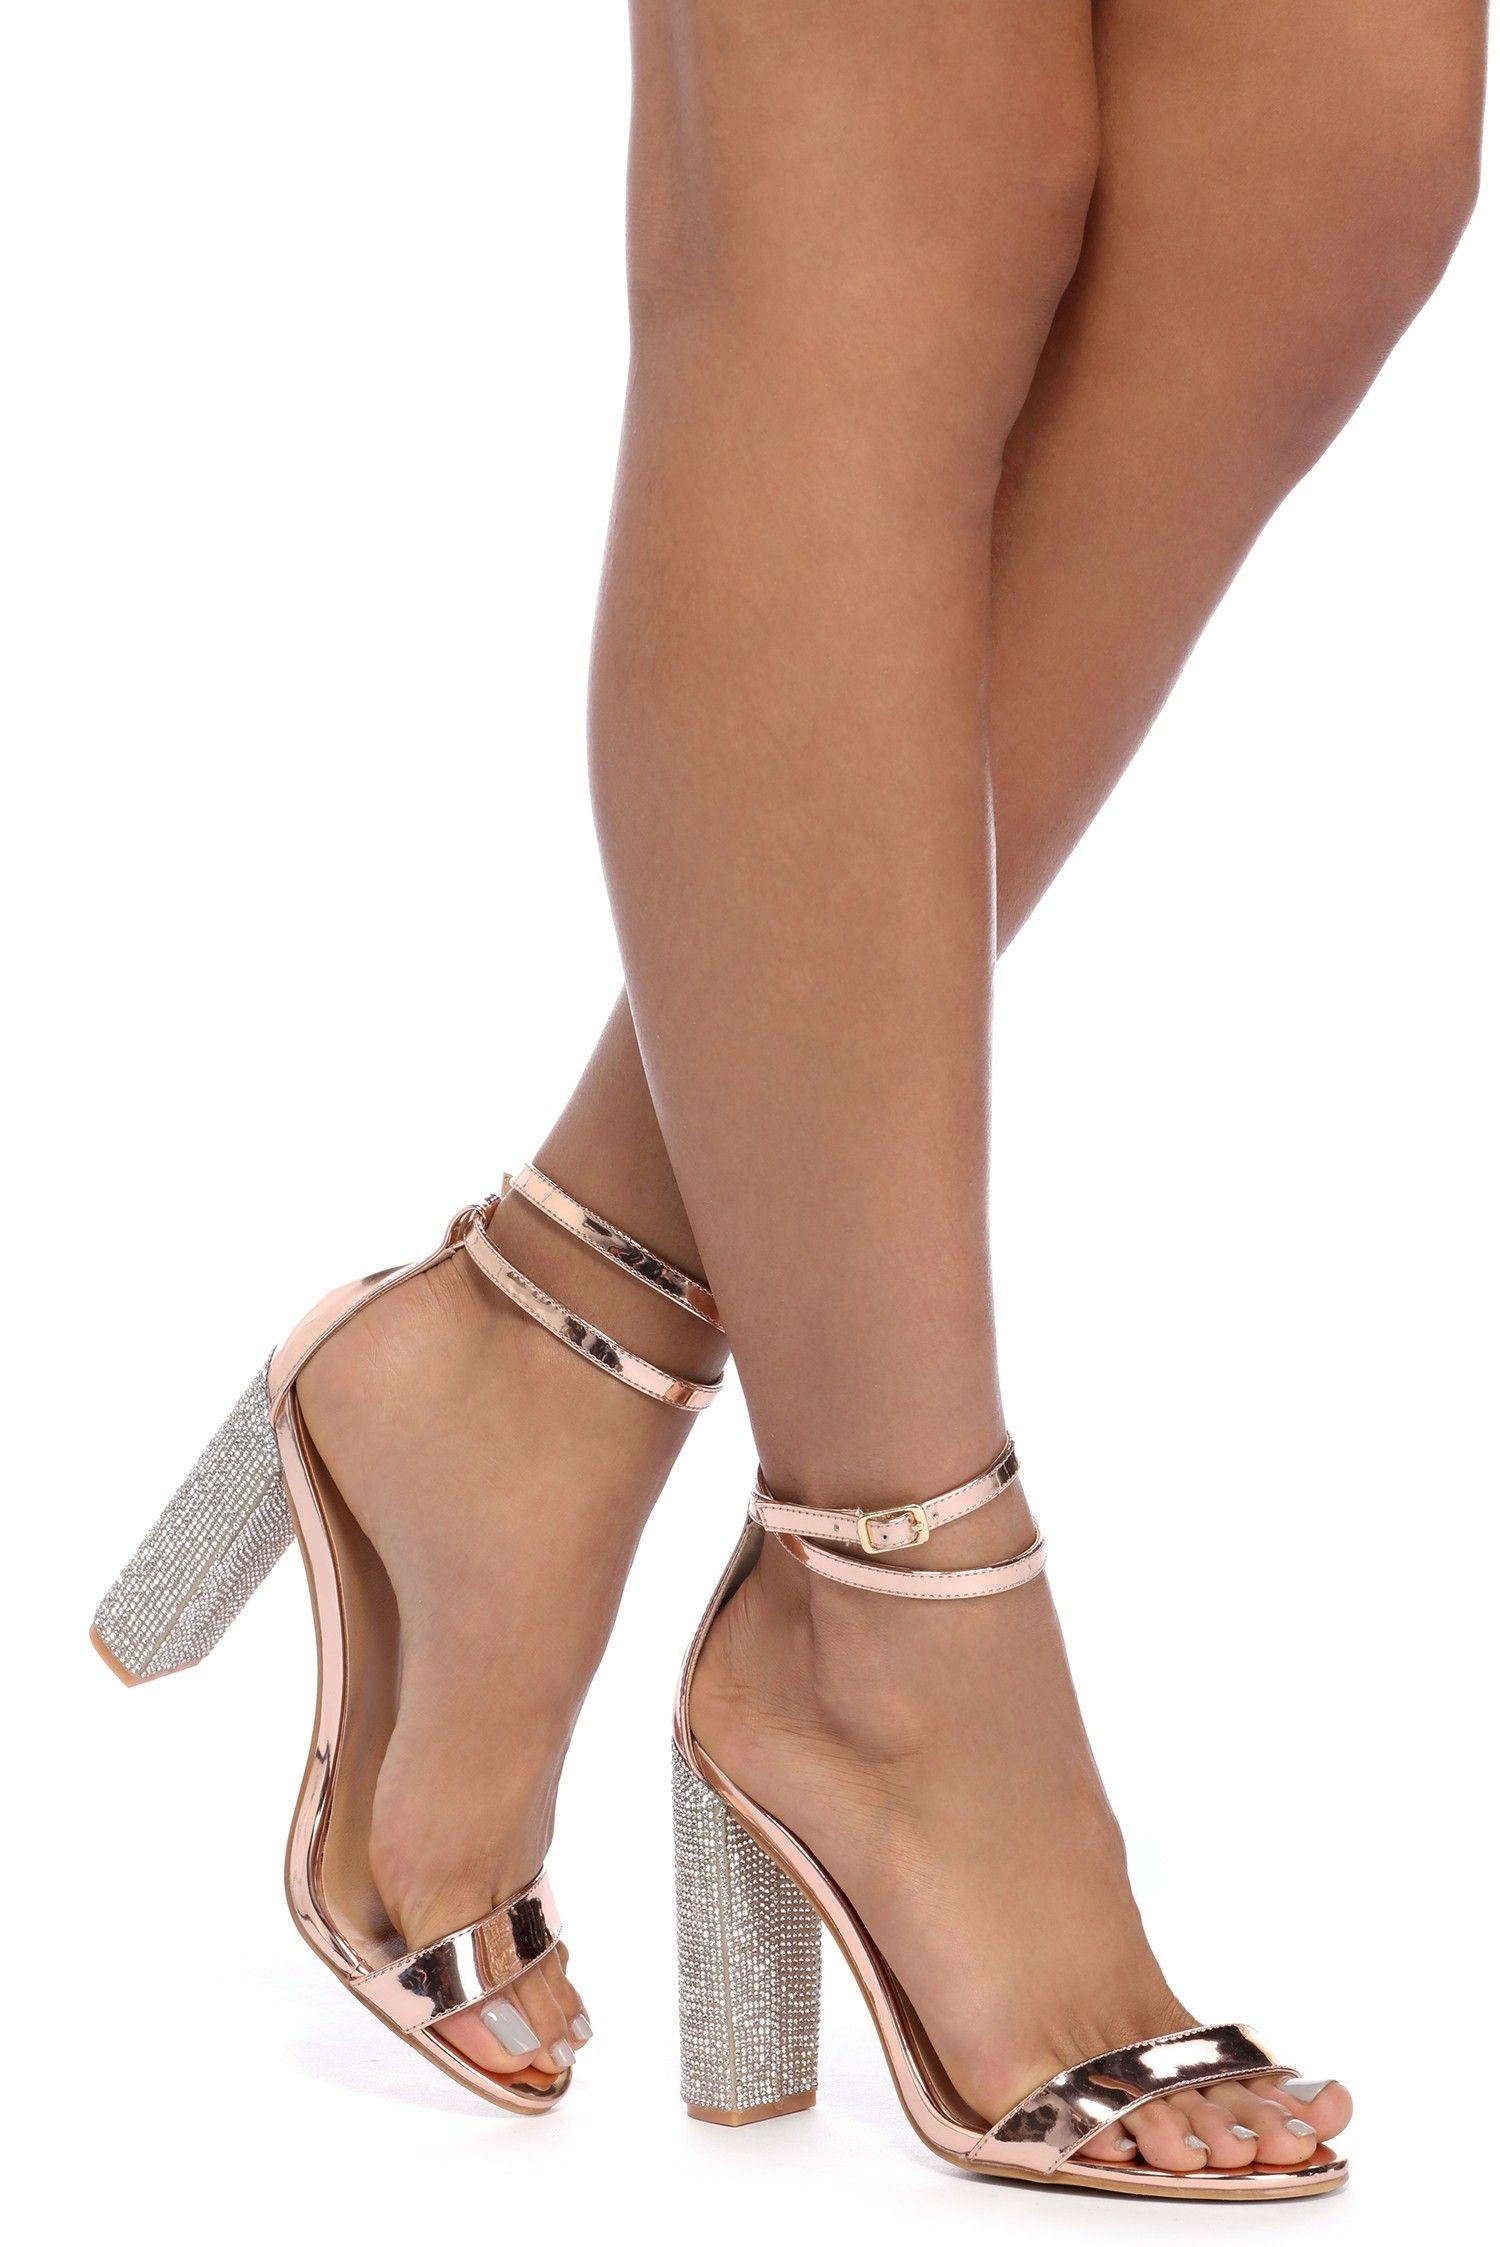 c2a2bb2ef58 Rose Gold Rhinestone Block Heels